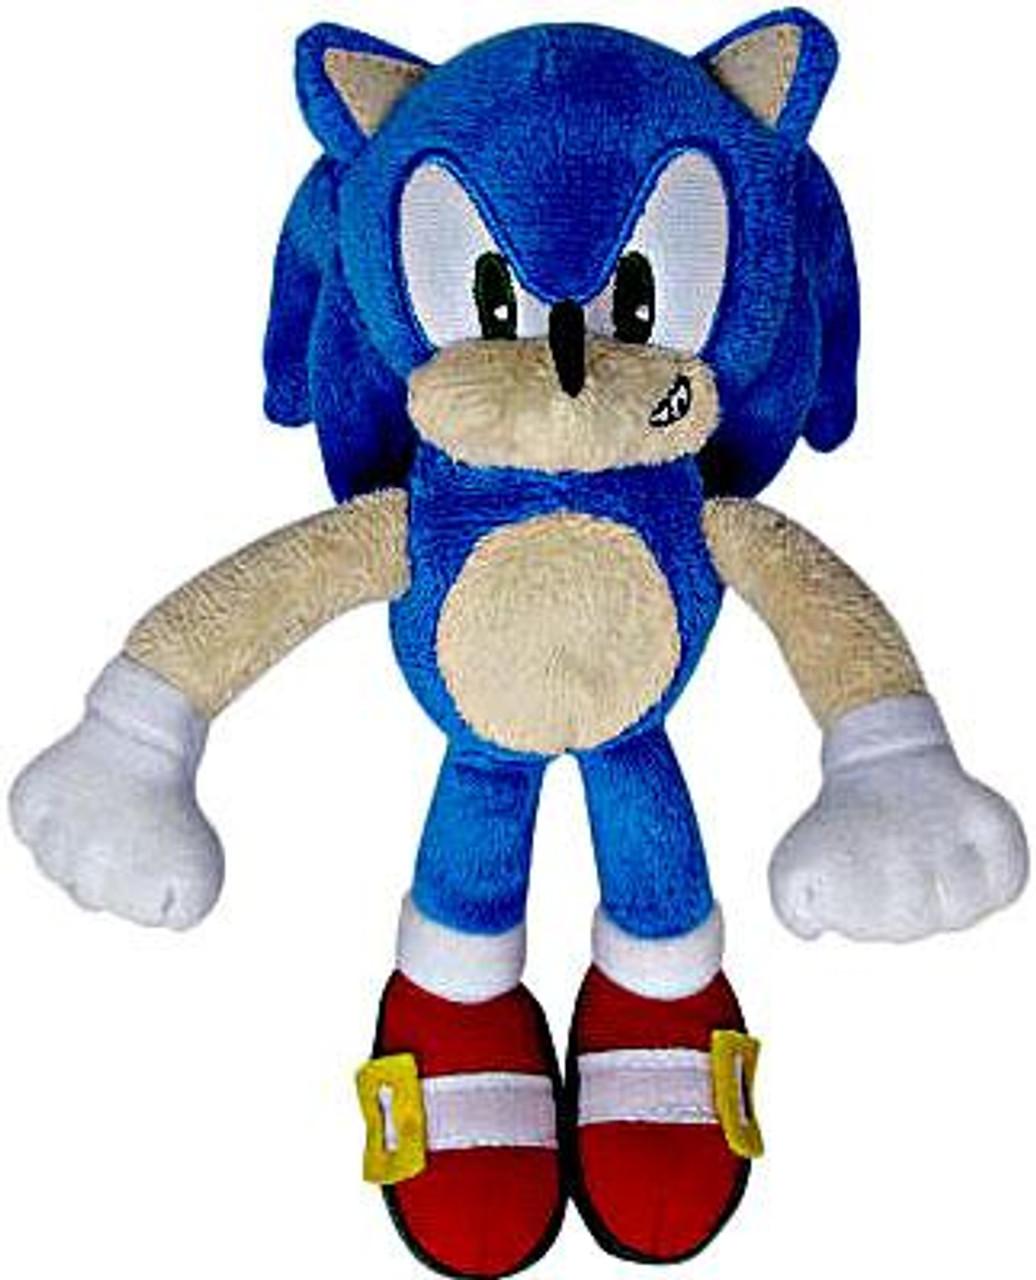 Sonic The Hedgehog 20th Anniversary Sonic 7-Inch Plush [Modern]